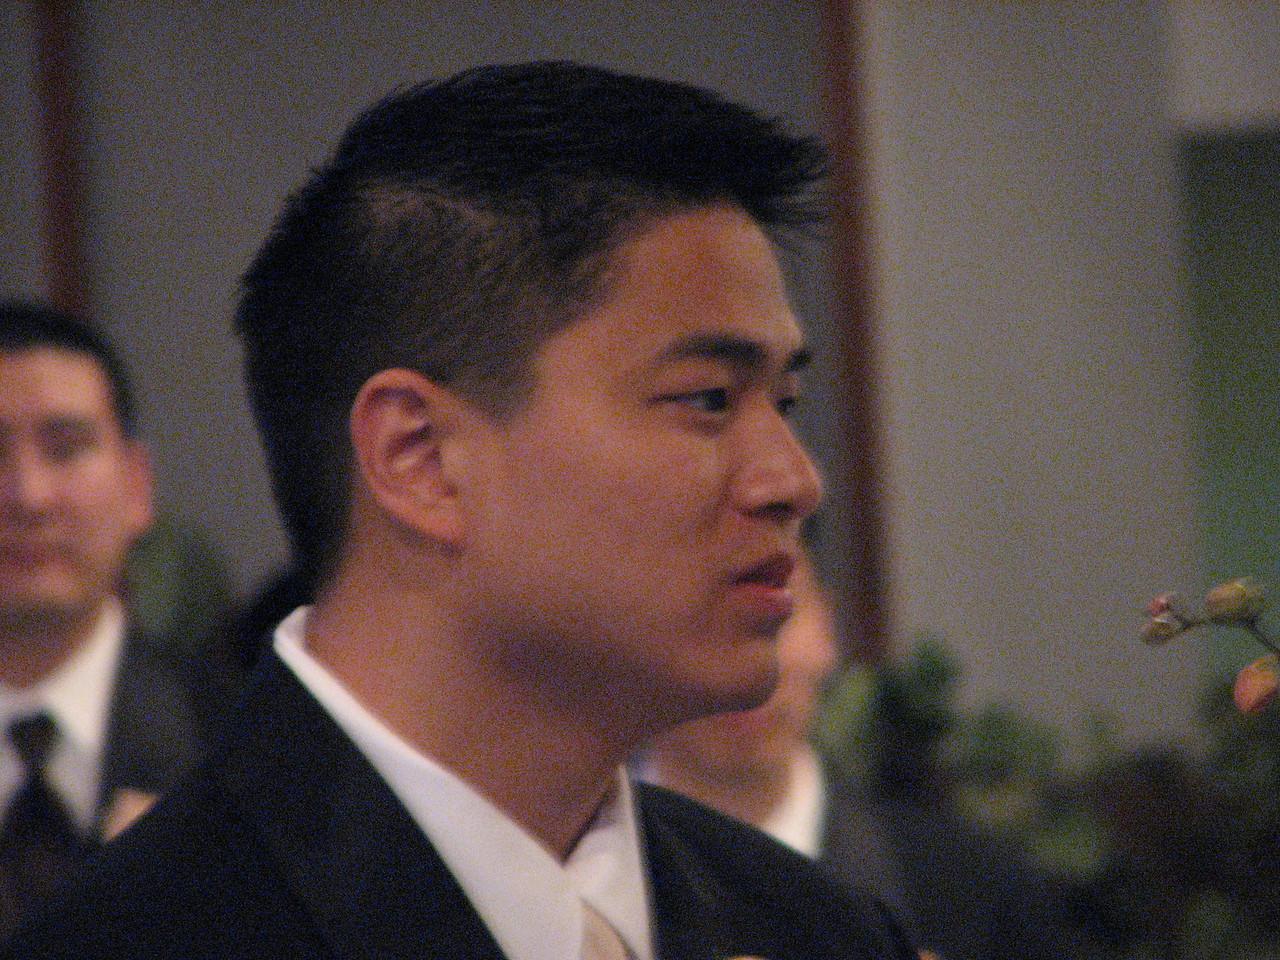 2007 06 09 Sat - The groom